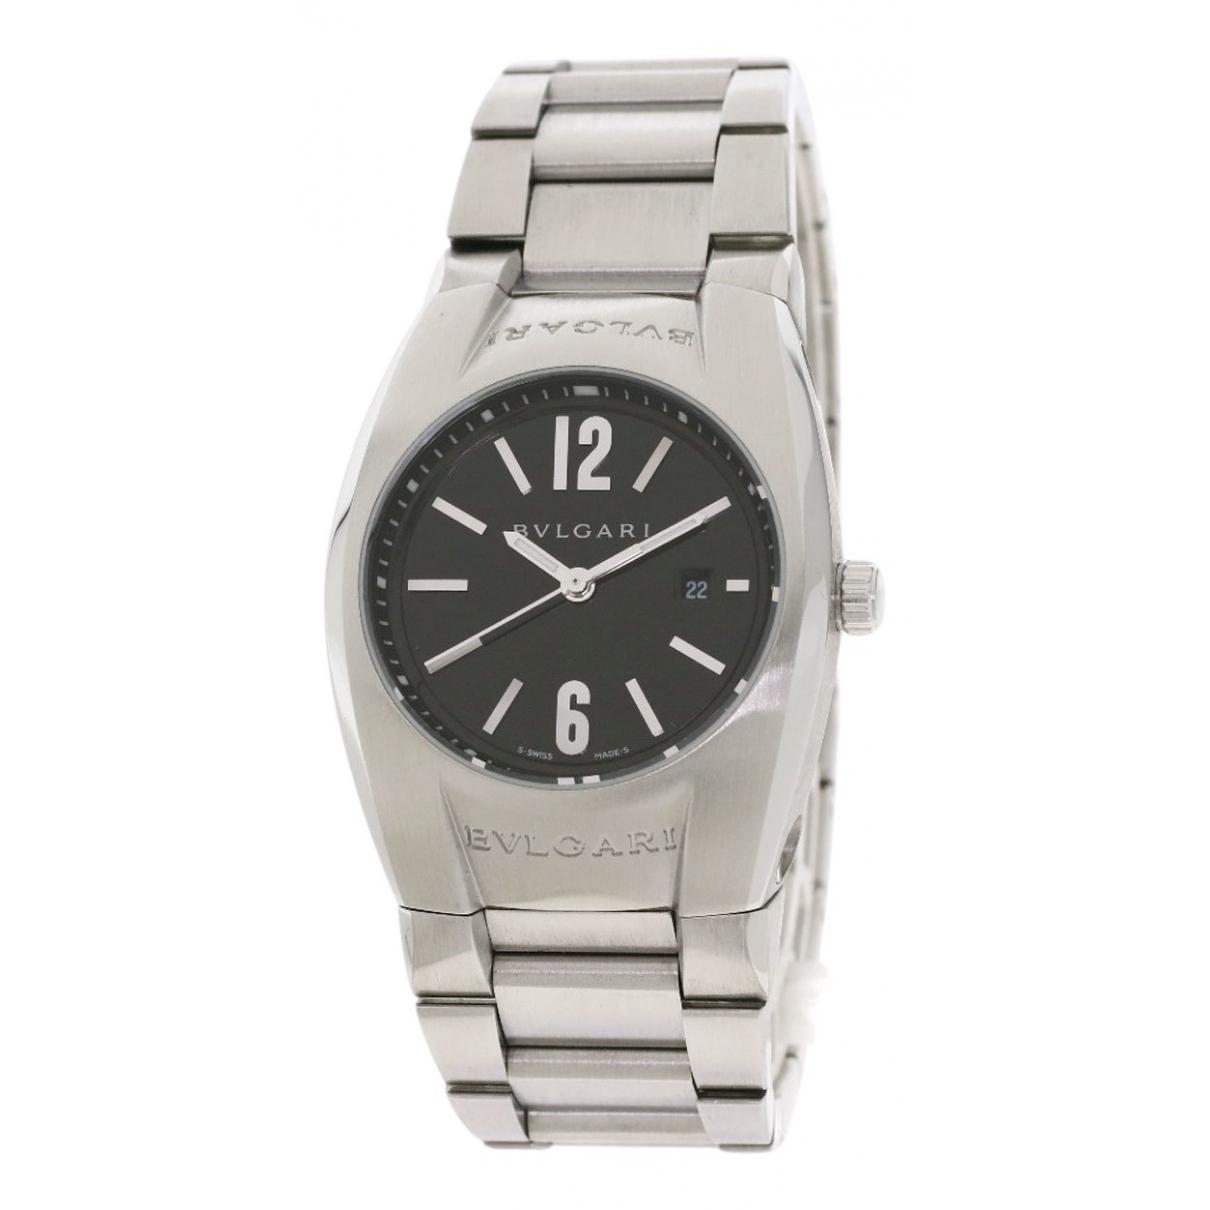 Reloj Ergon Bvlgari